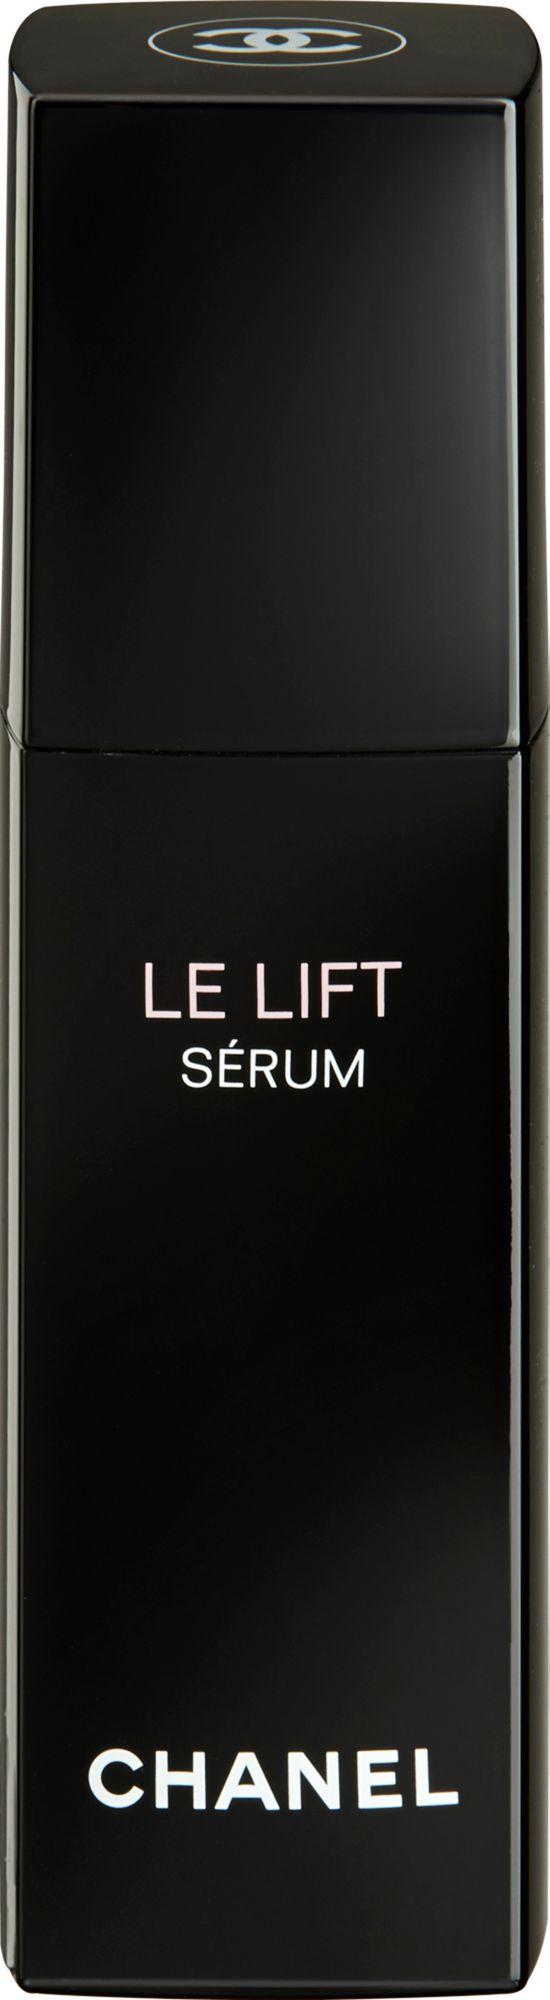 CHANEL Chanel, »Le Lift Sérum«, Gesichtsserum